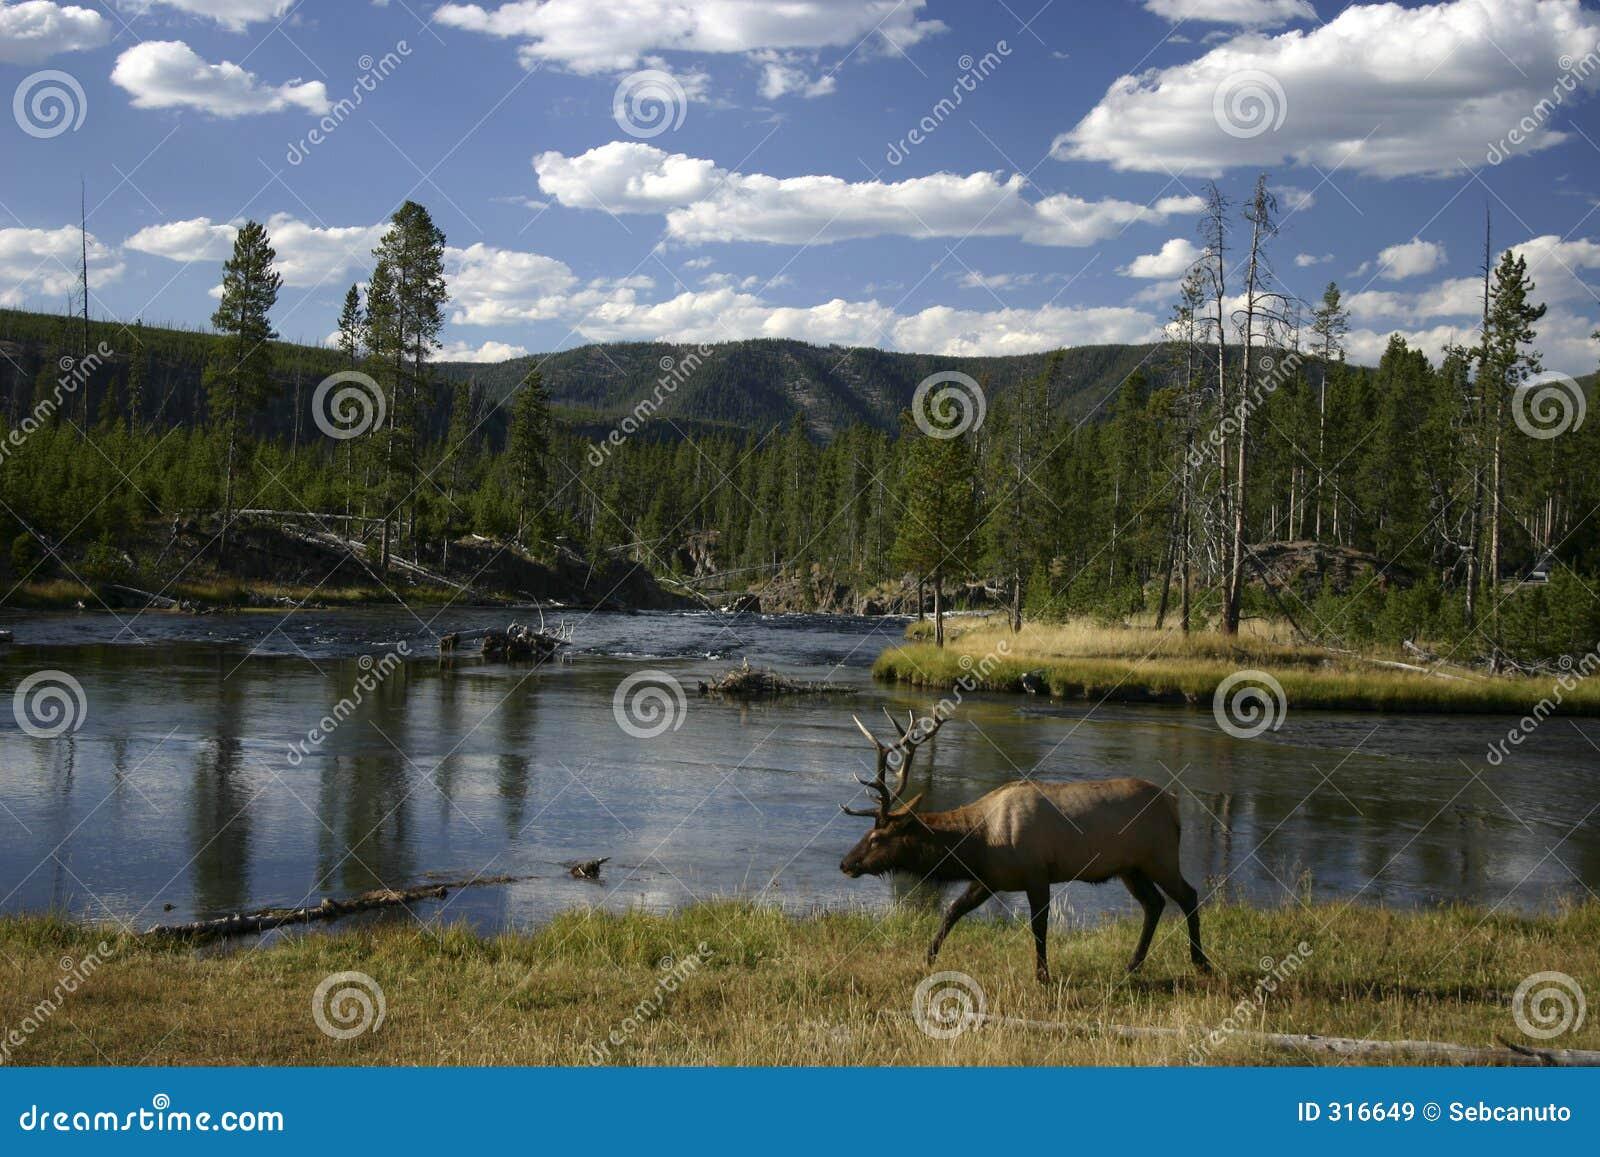 Elk walking along a river